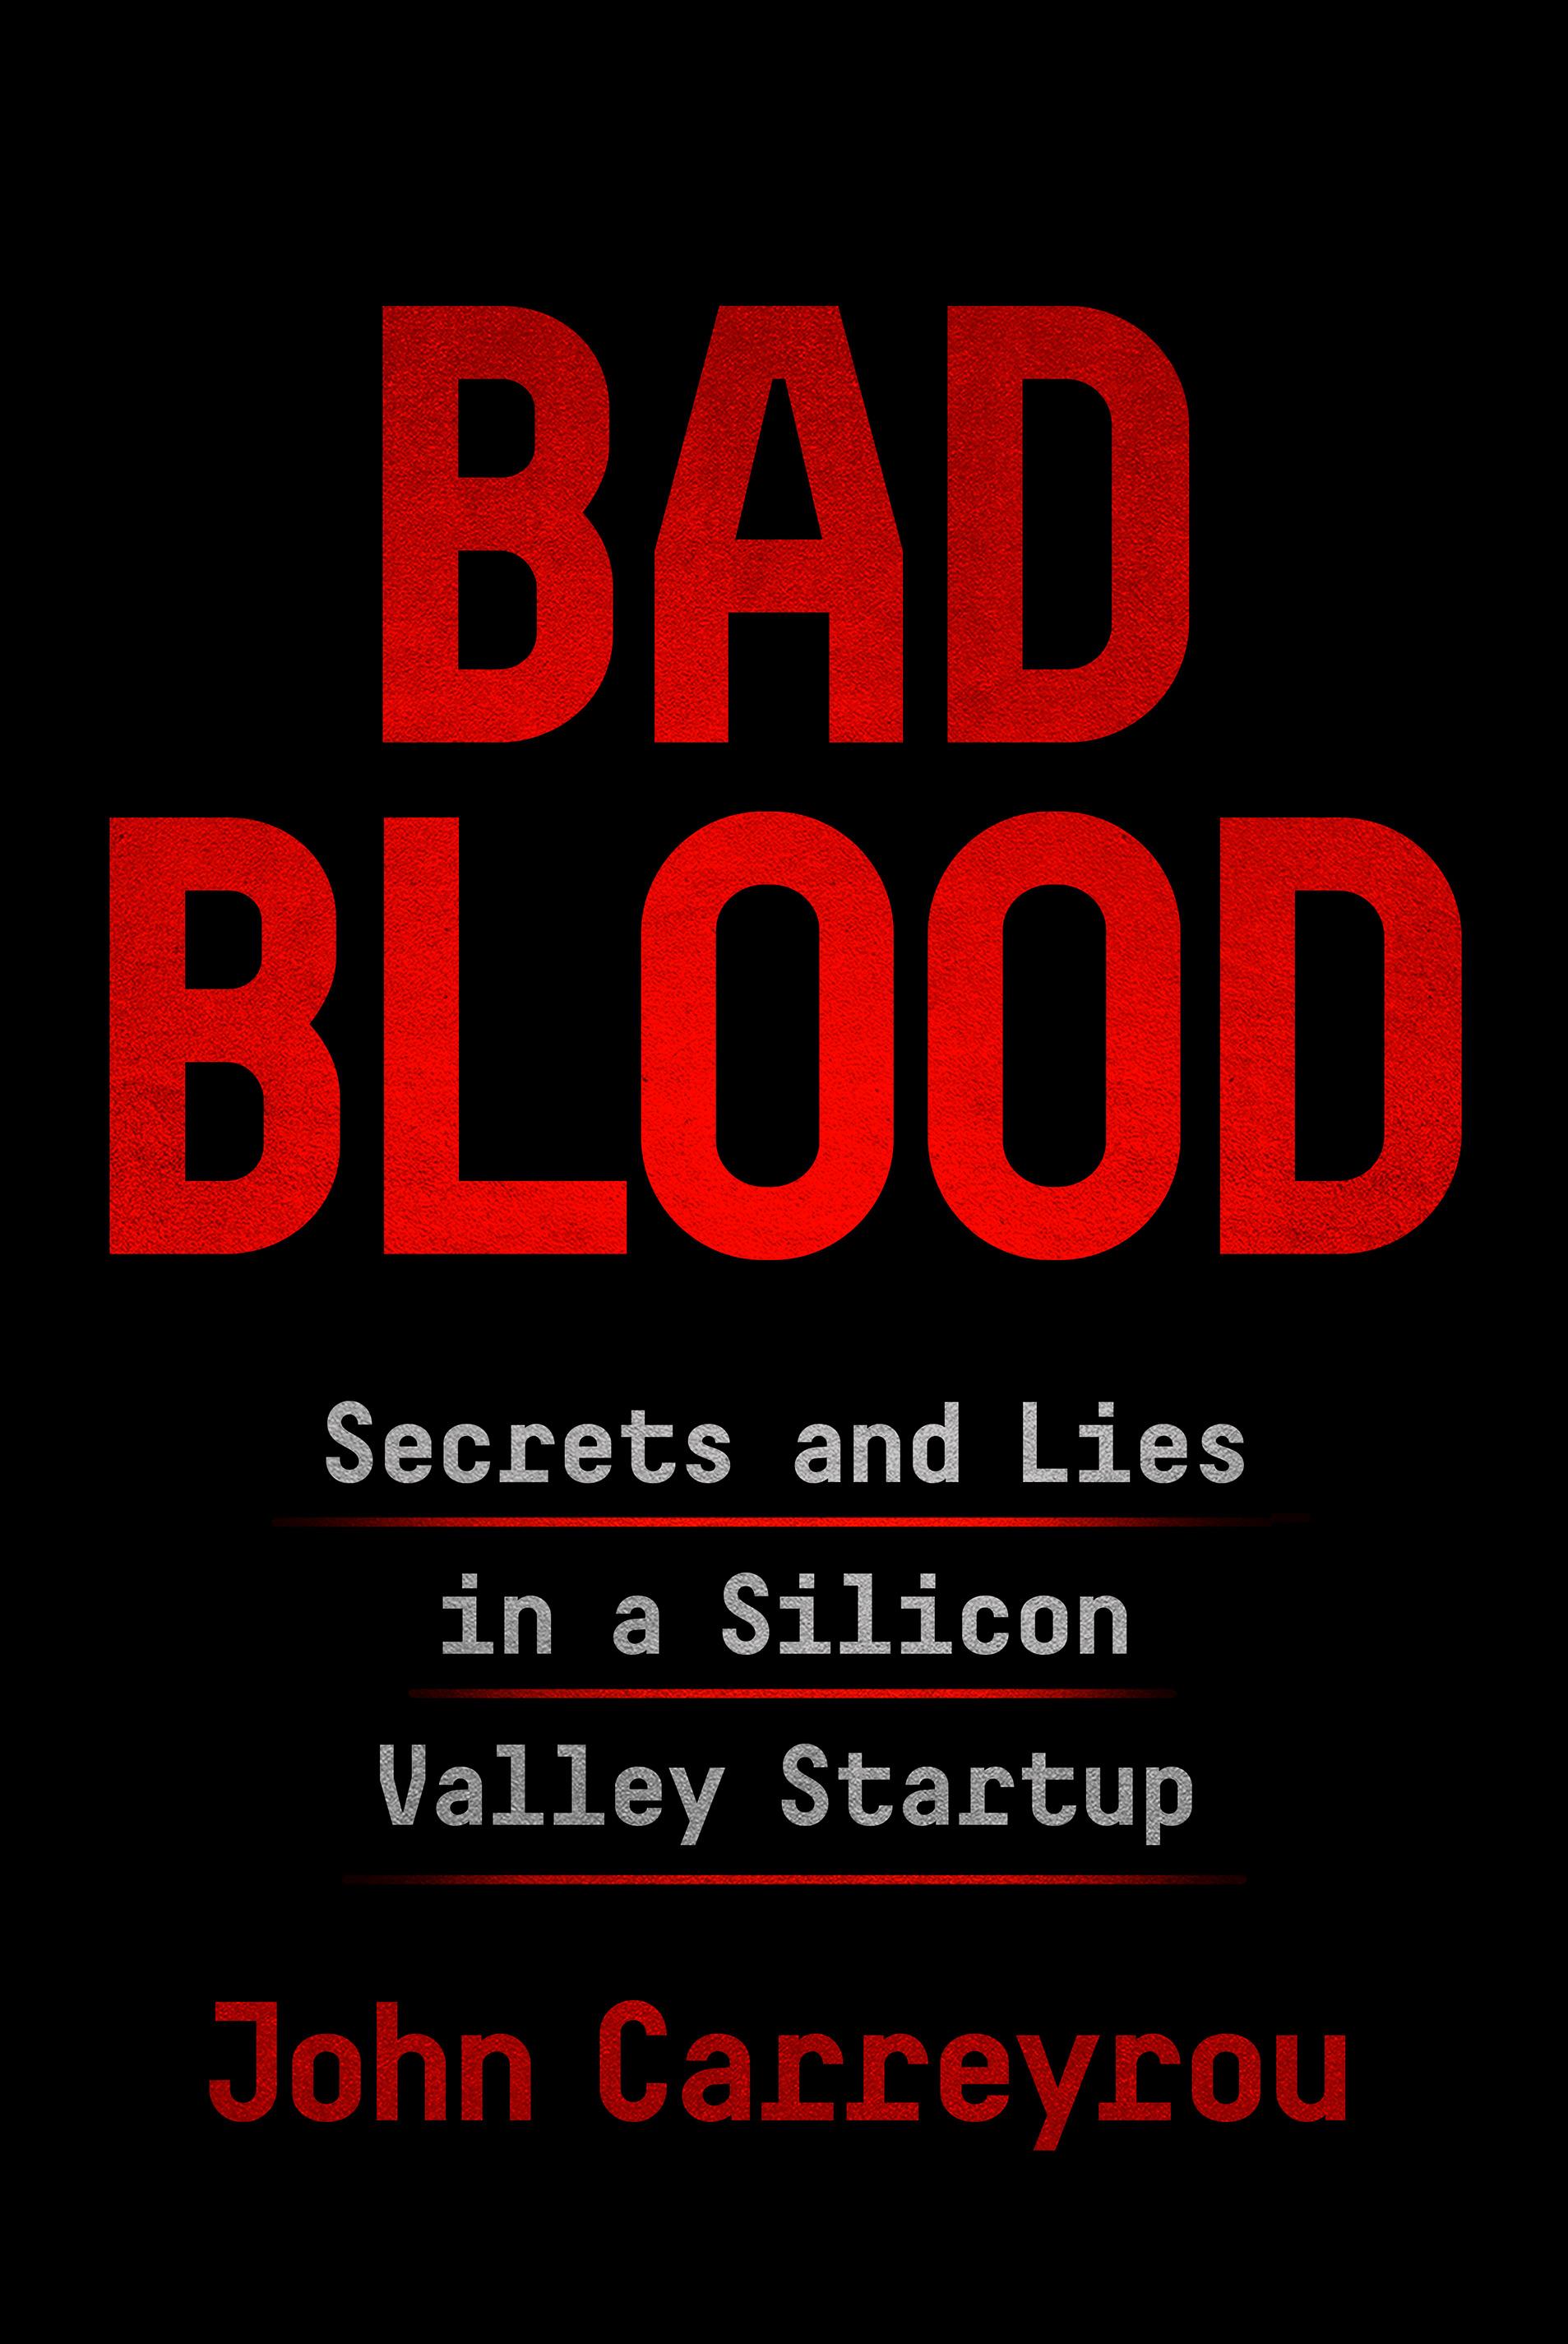 Bad Blood.jpg